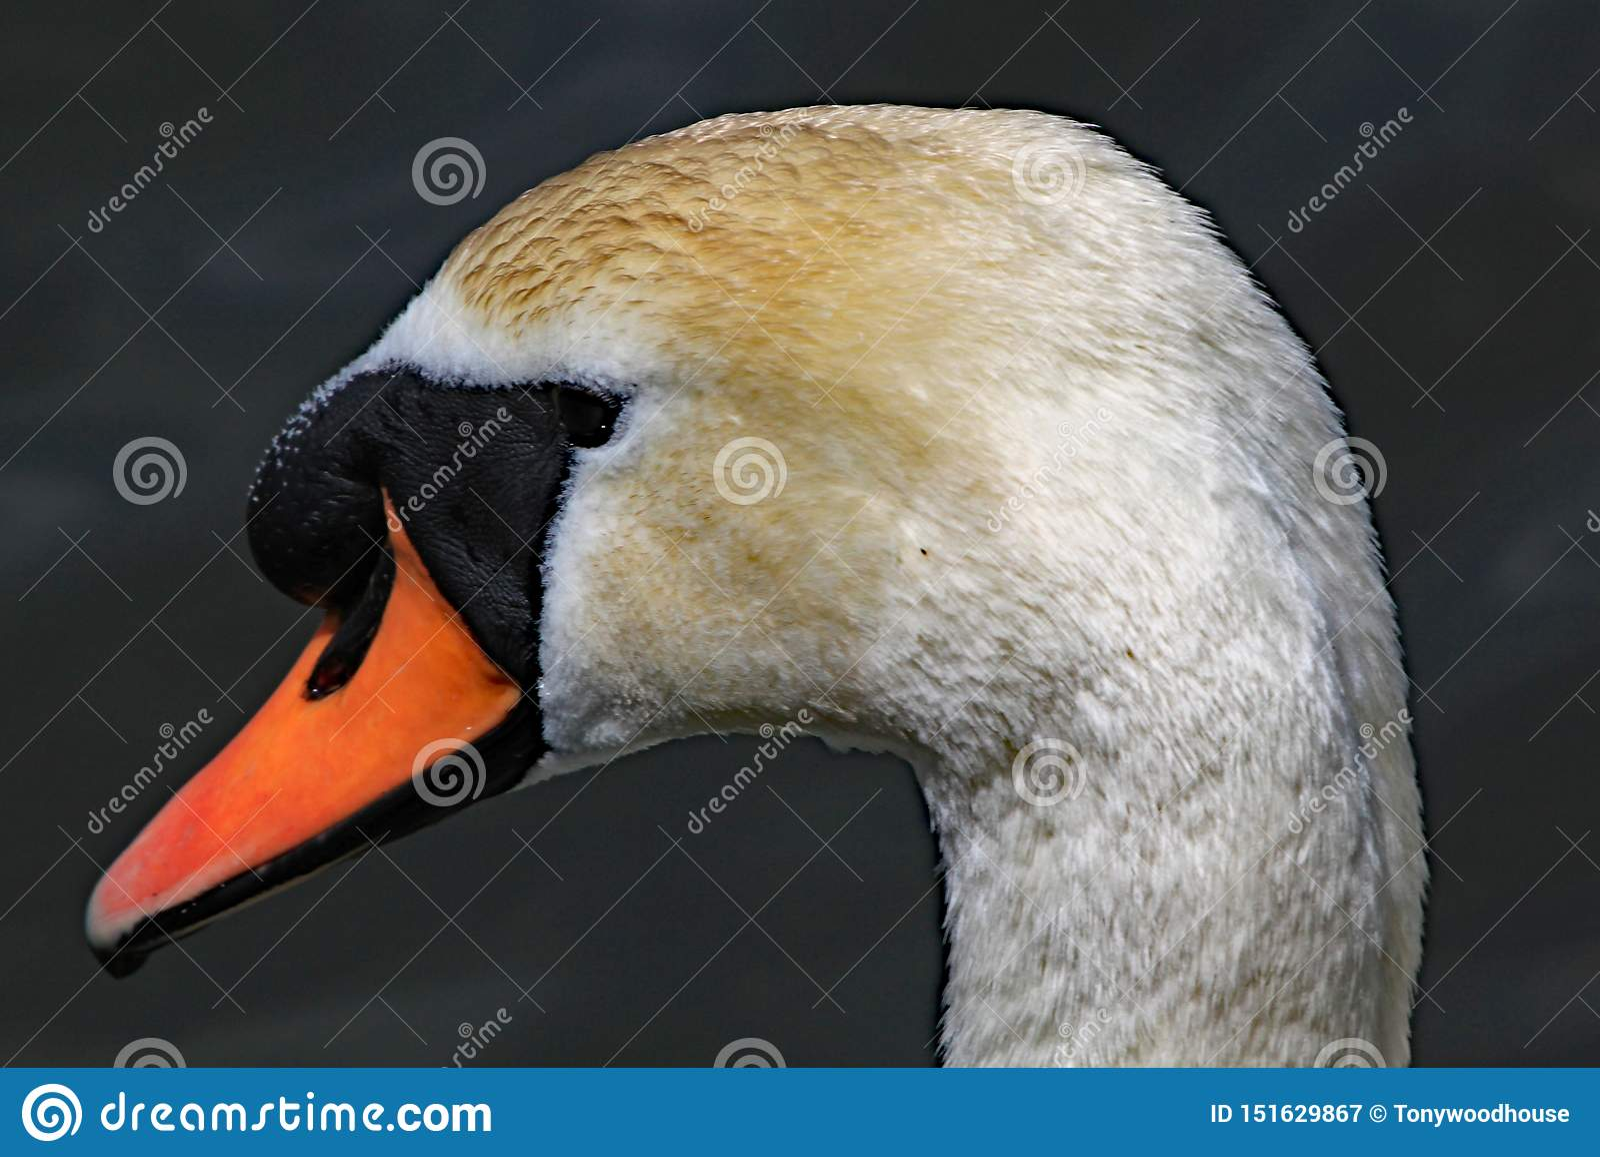 Nära övre profil av stum svans huvud